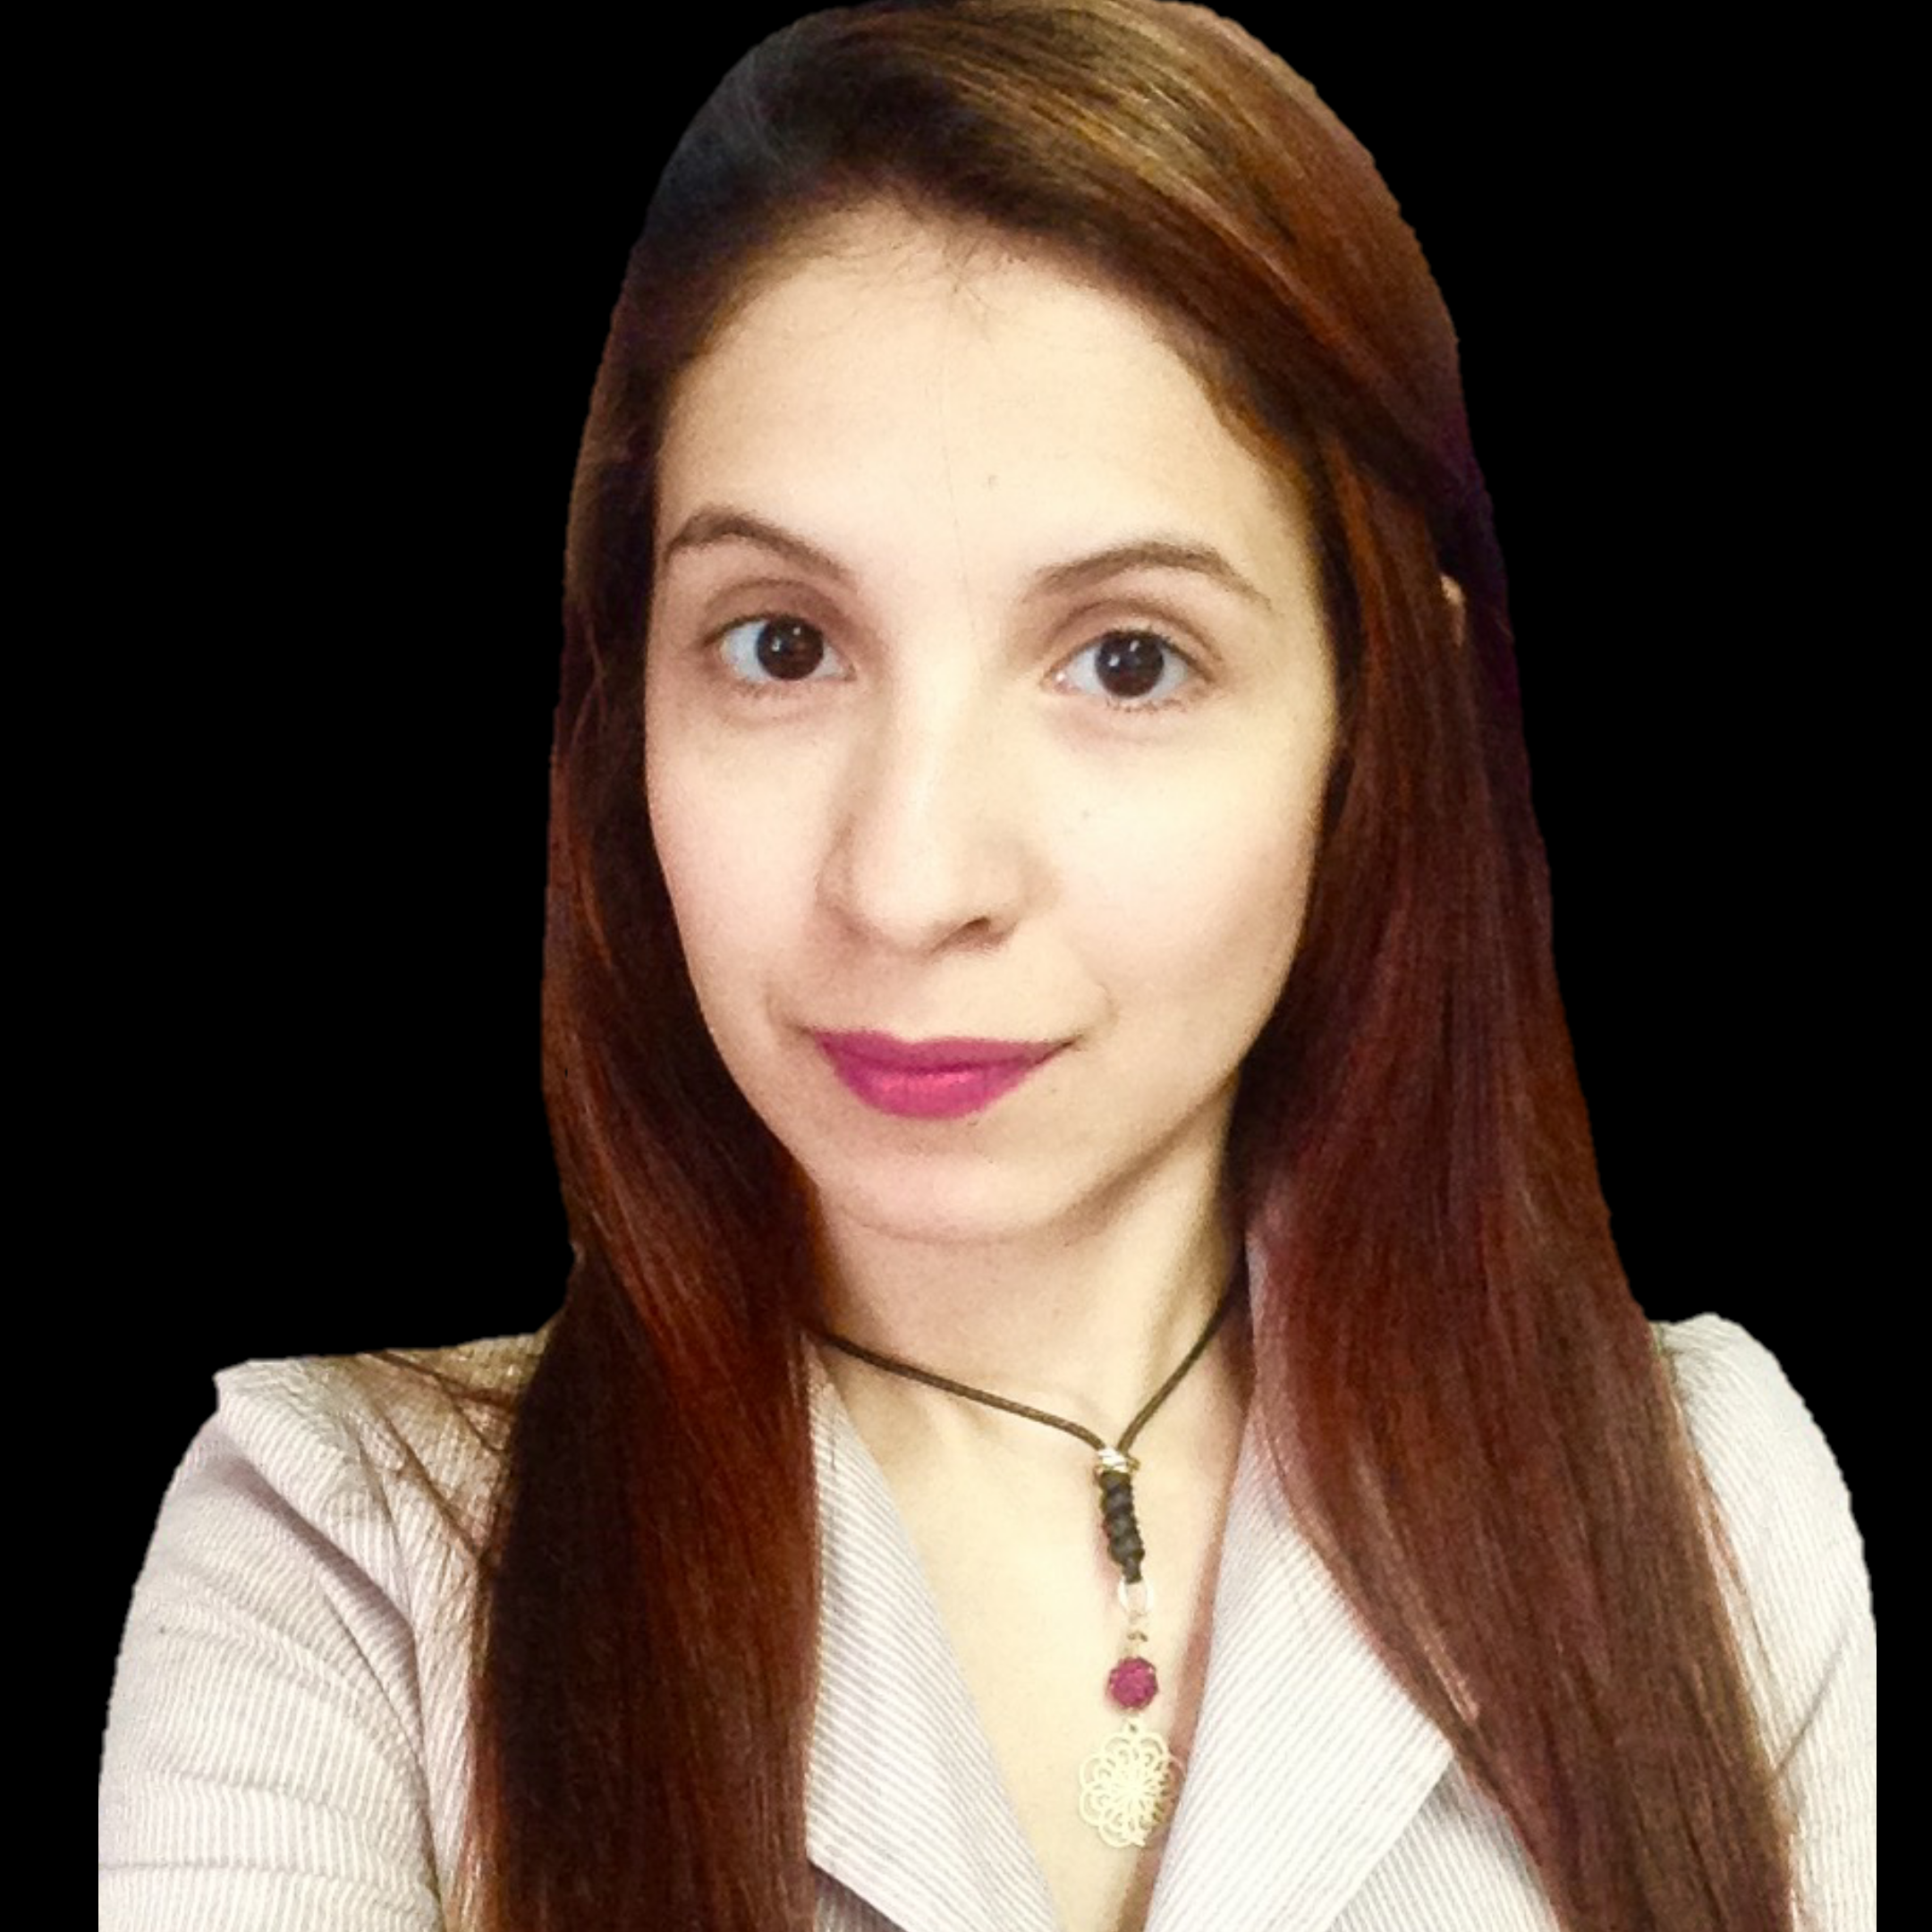 Patricia Balzán